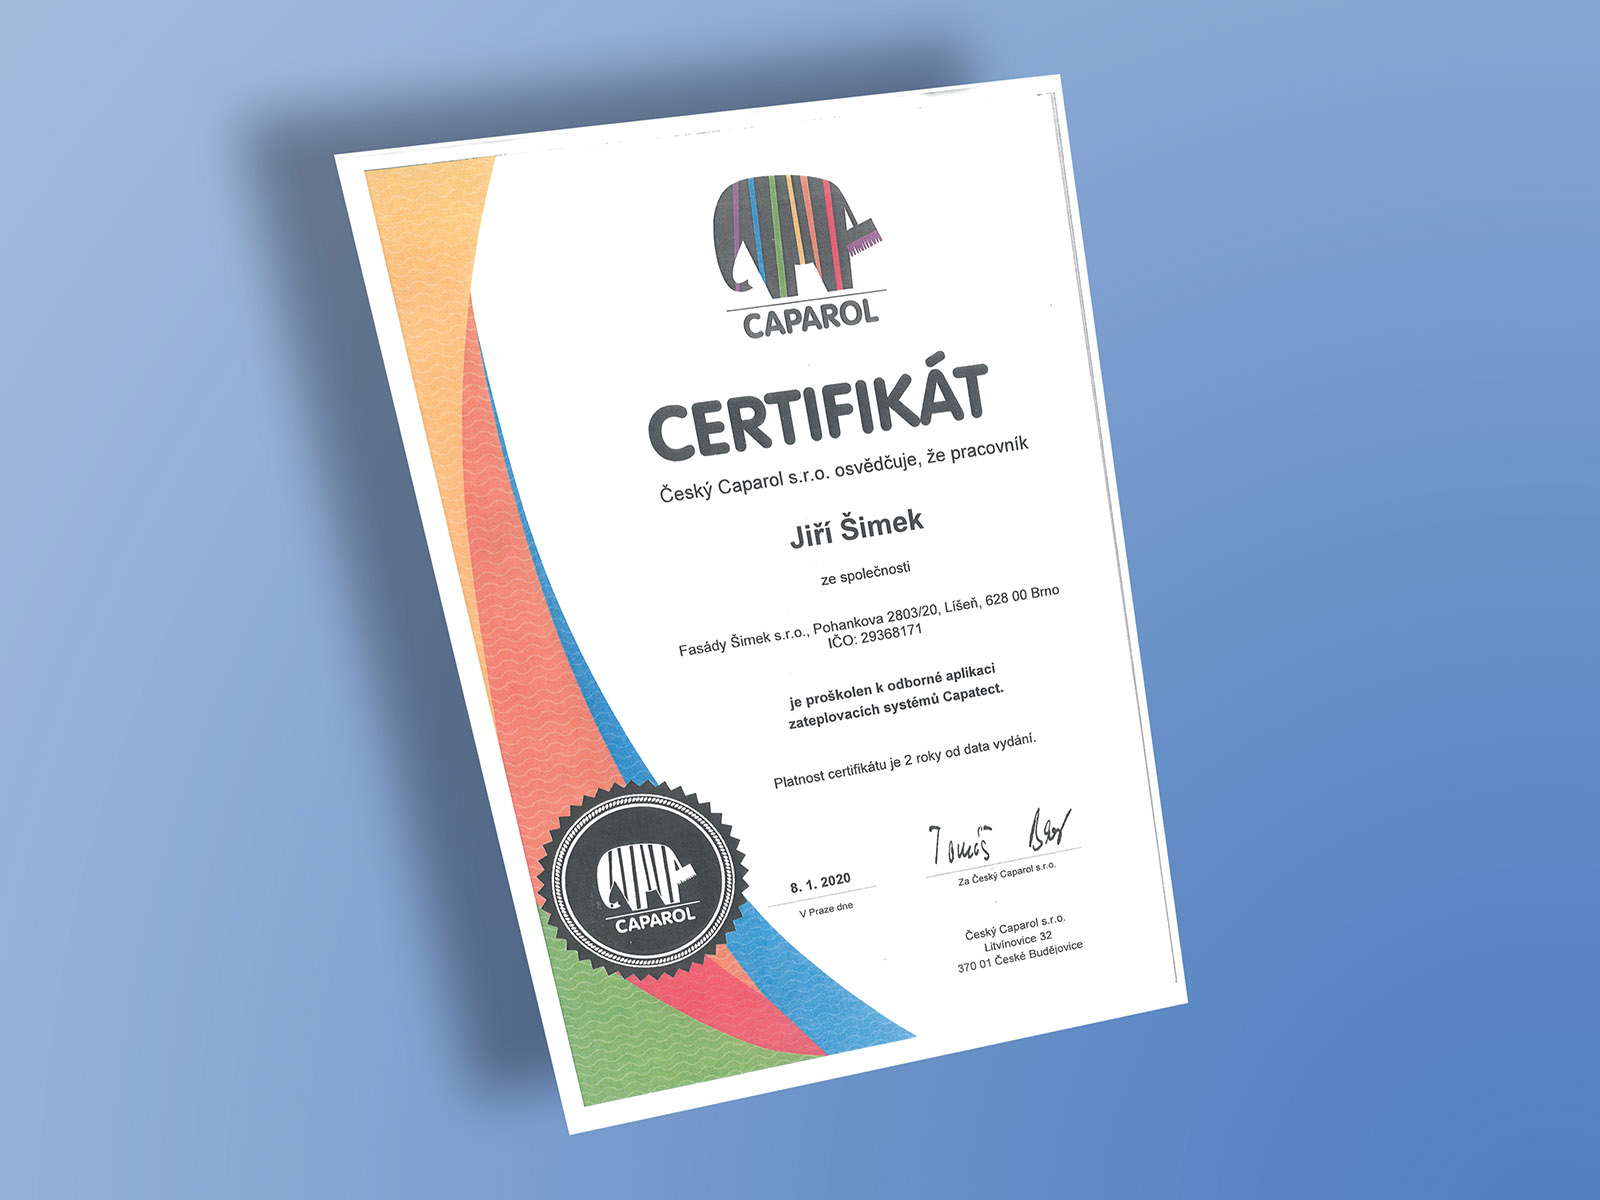 Certifikát CAPAROL II